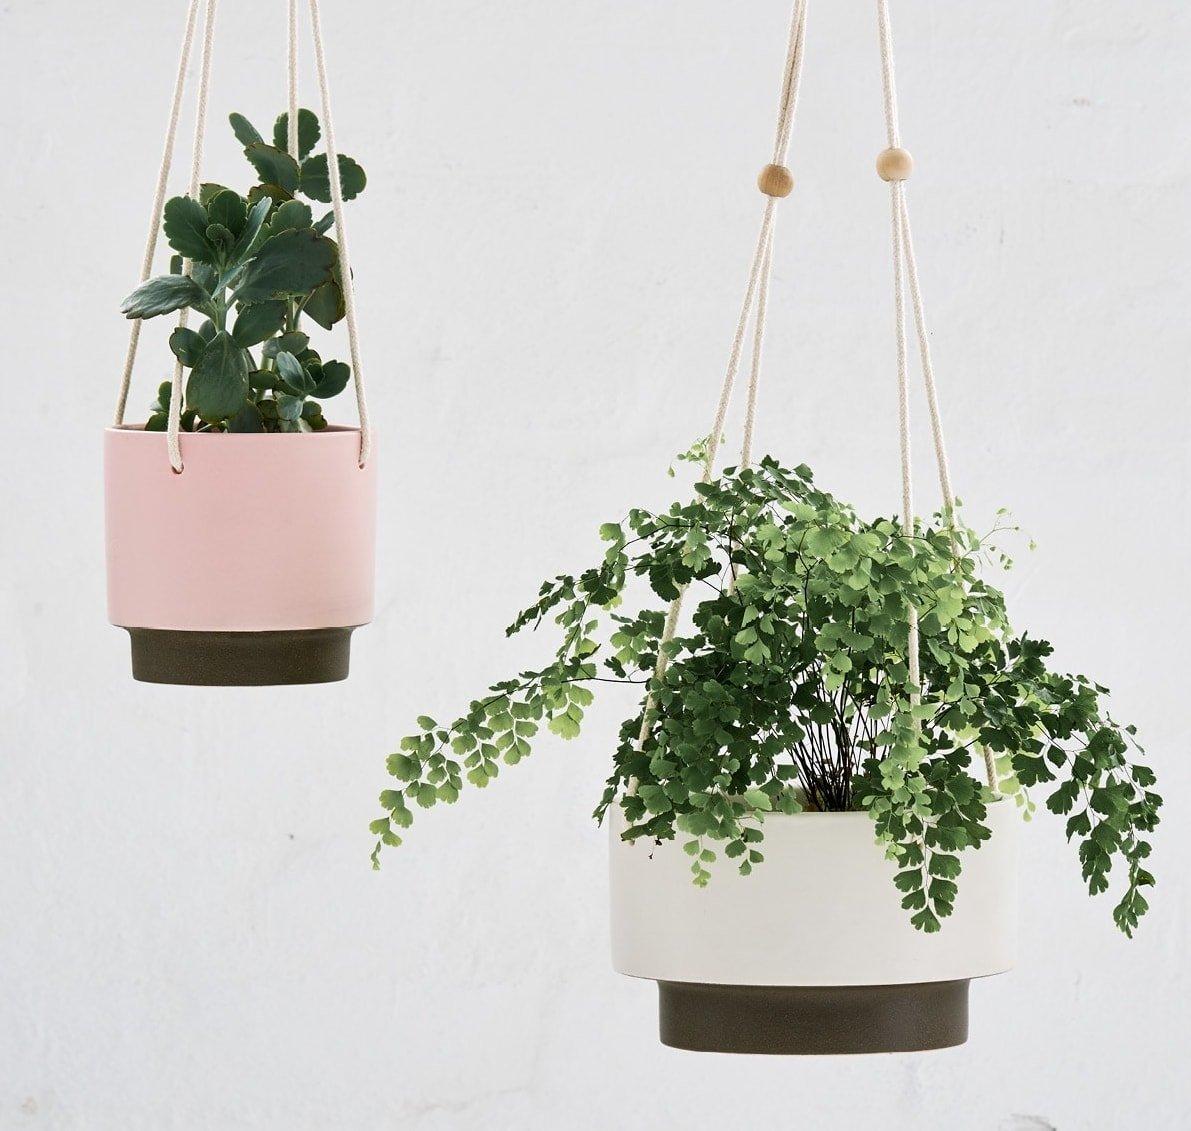 lorraine lea astrid hanging plant pots